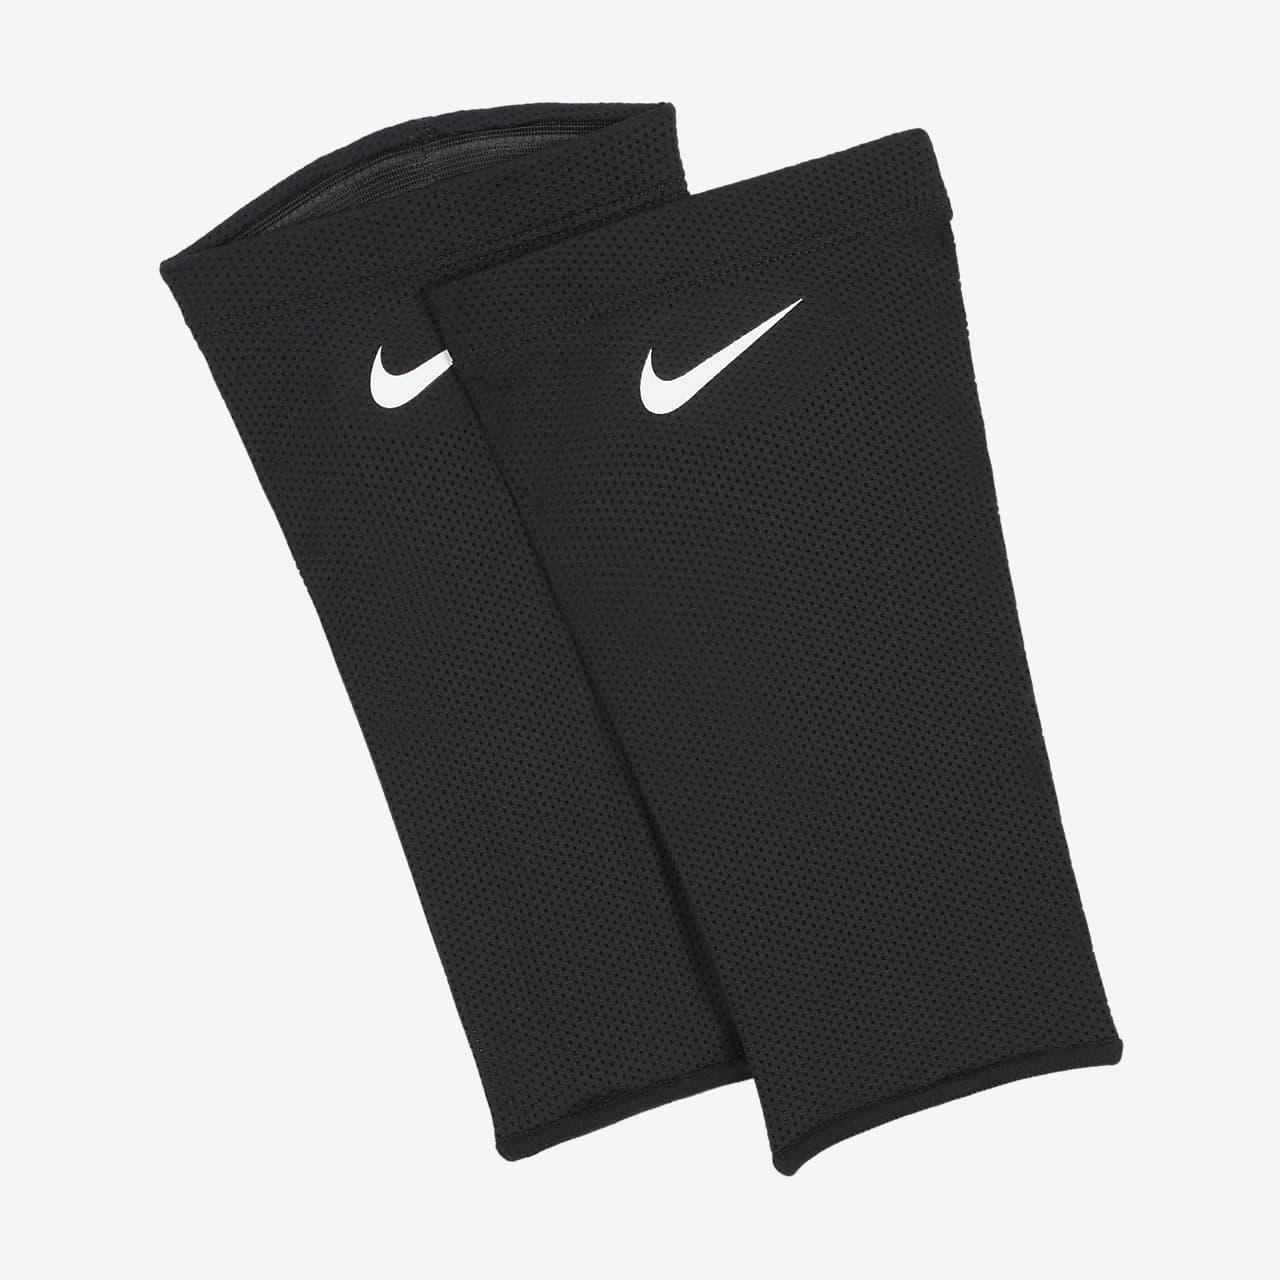 administración blusa Sillón  Nike Guard Lock Elite Mangas para espinilleras de fútbol (1 par). Nike ES